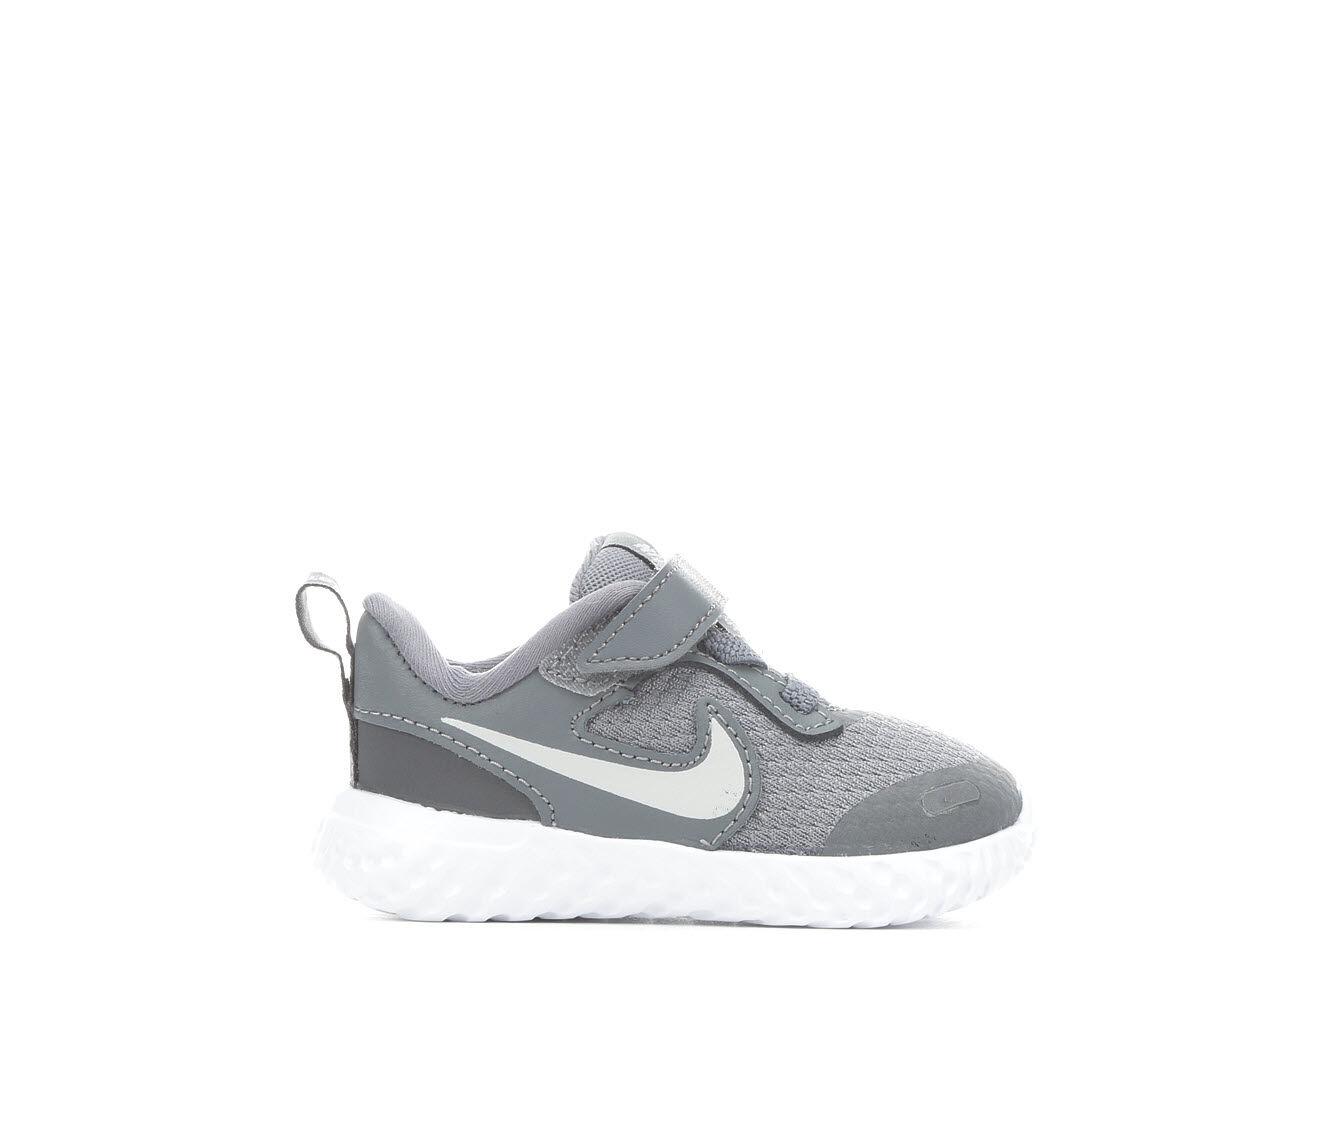 Boys' Nike Infant \u0026 Toddler Revolution